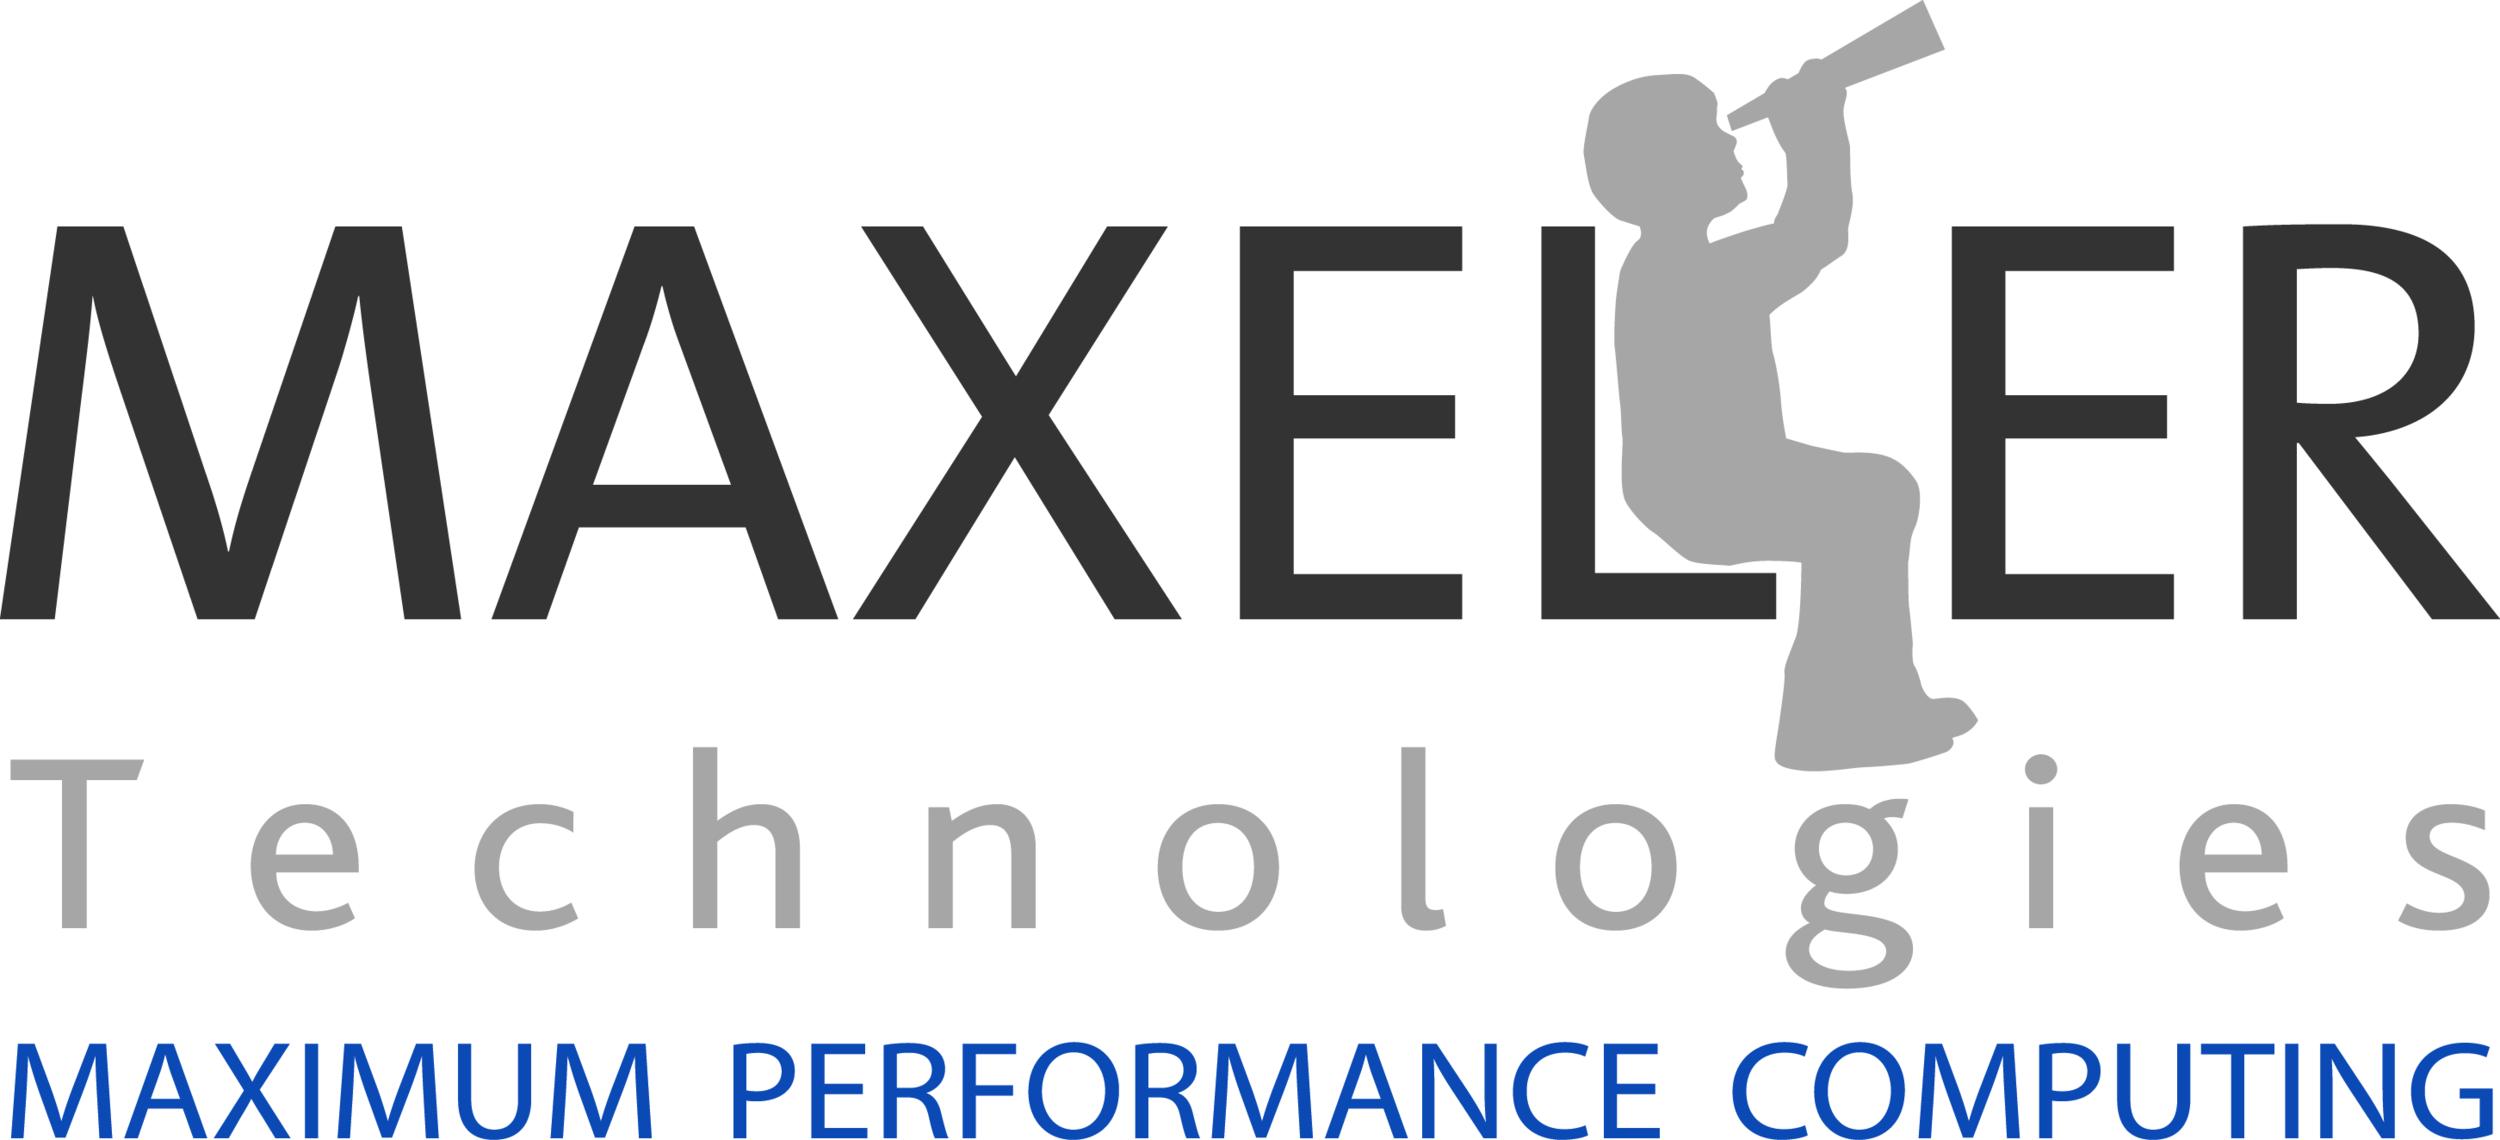 Maxeler-logo.png